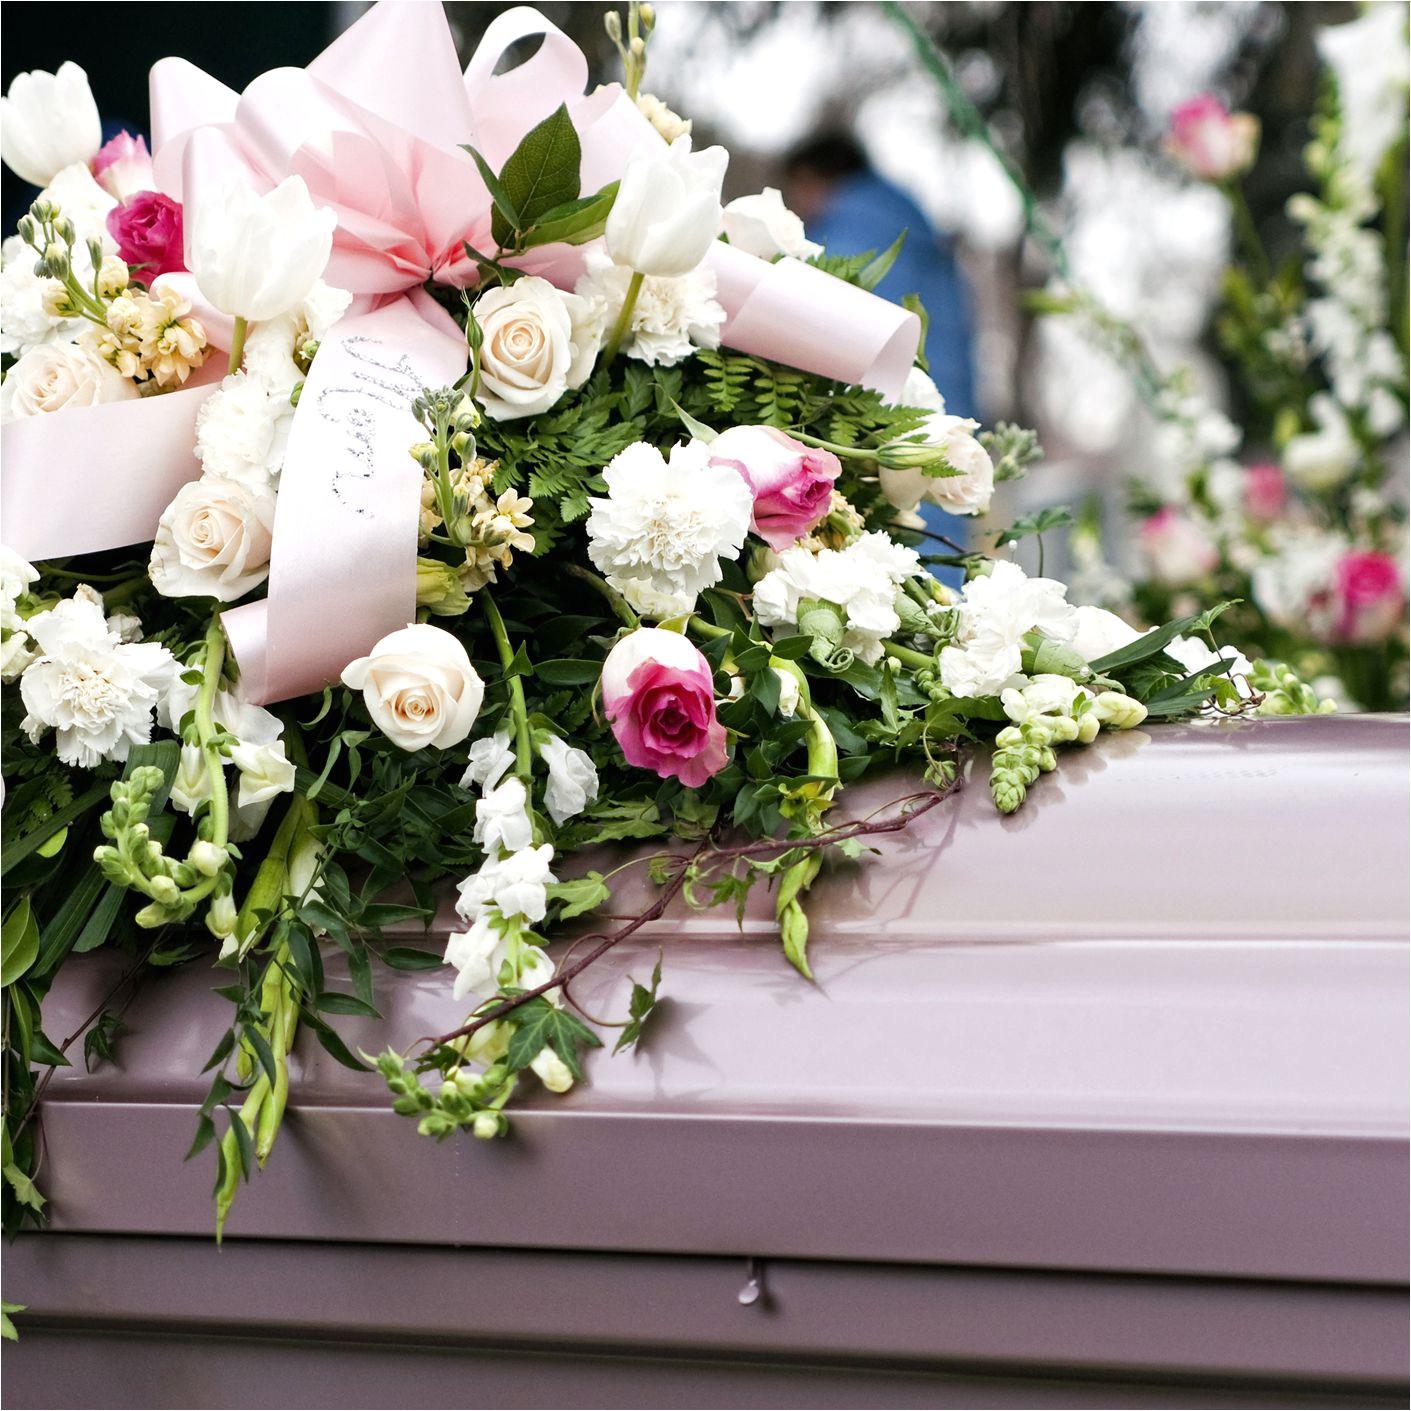 funeral flowers 56a274ec5f9b58b7d0cabeac jpg